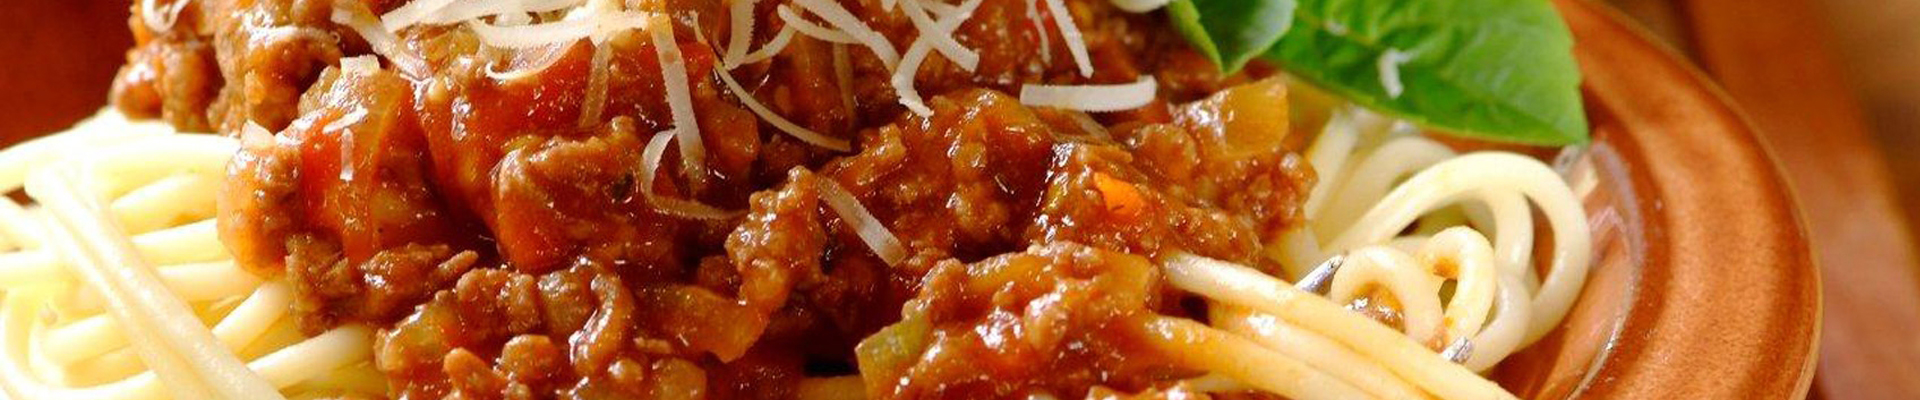 spaghetti-al-ragu-2